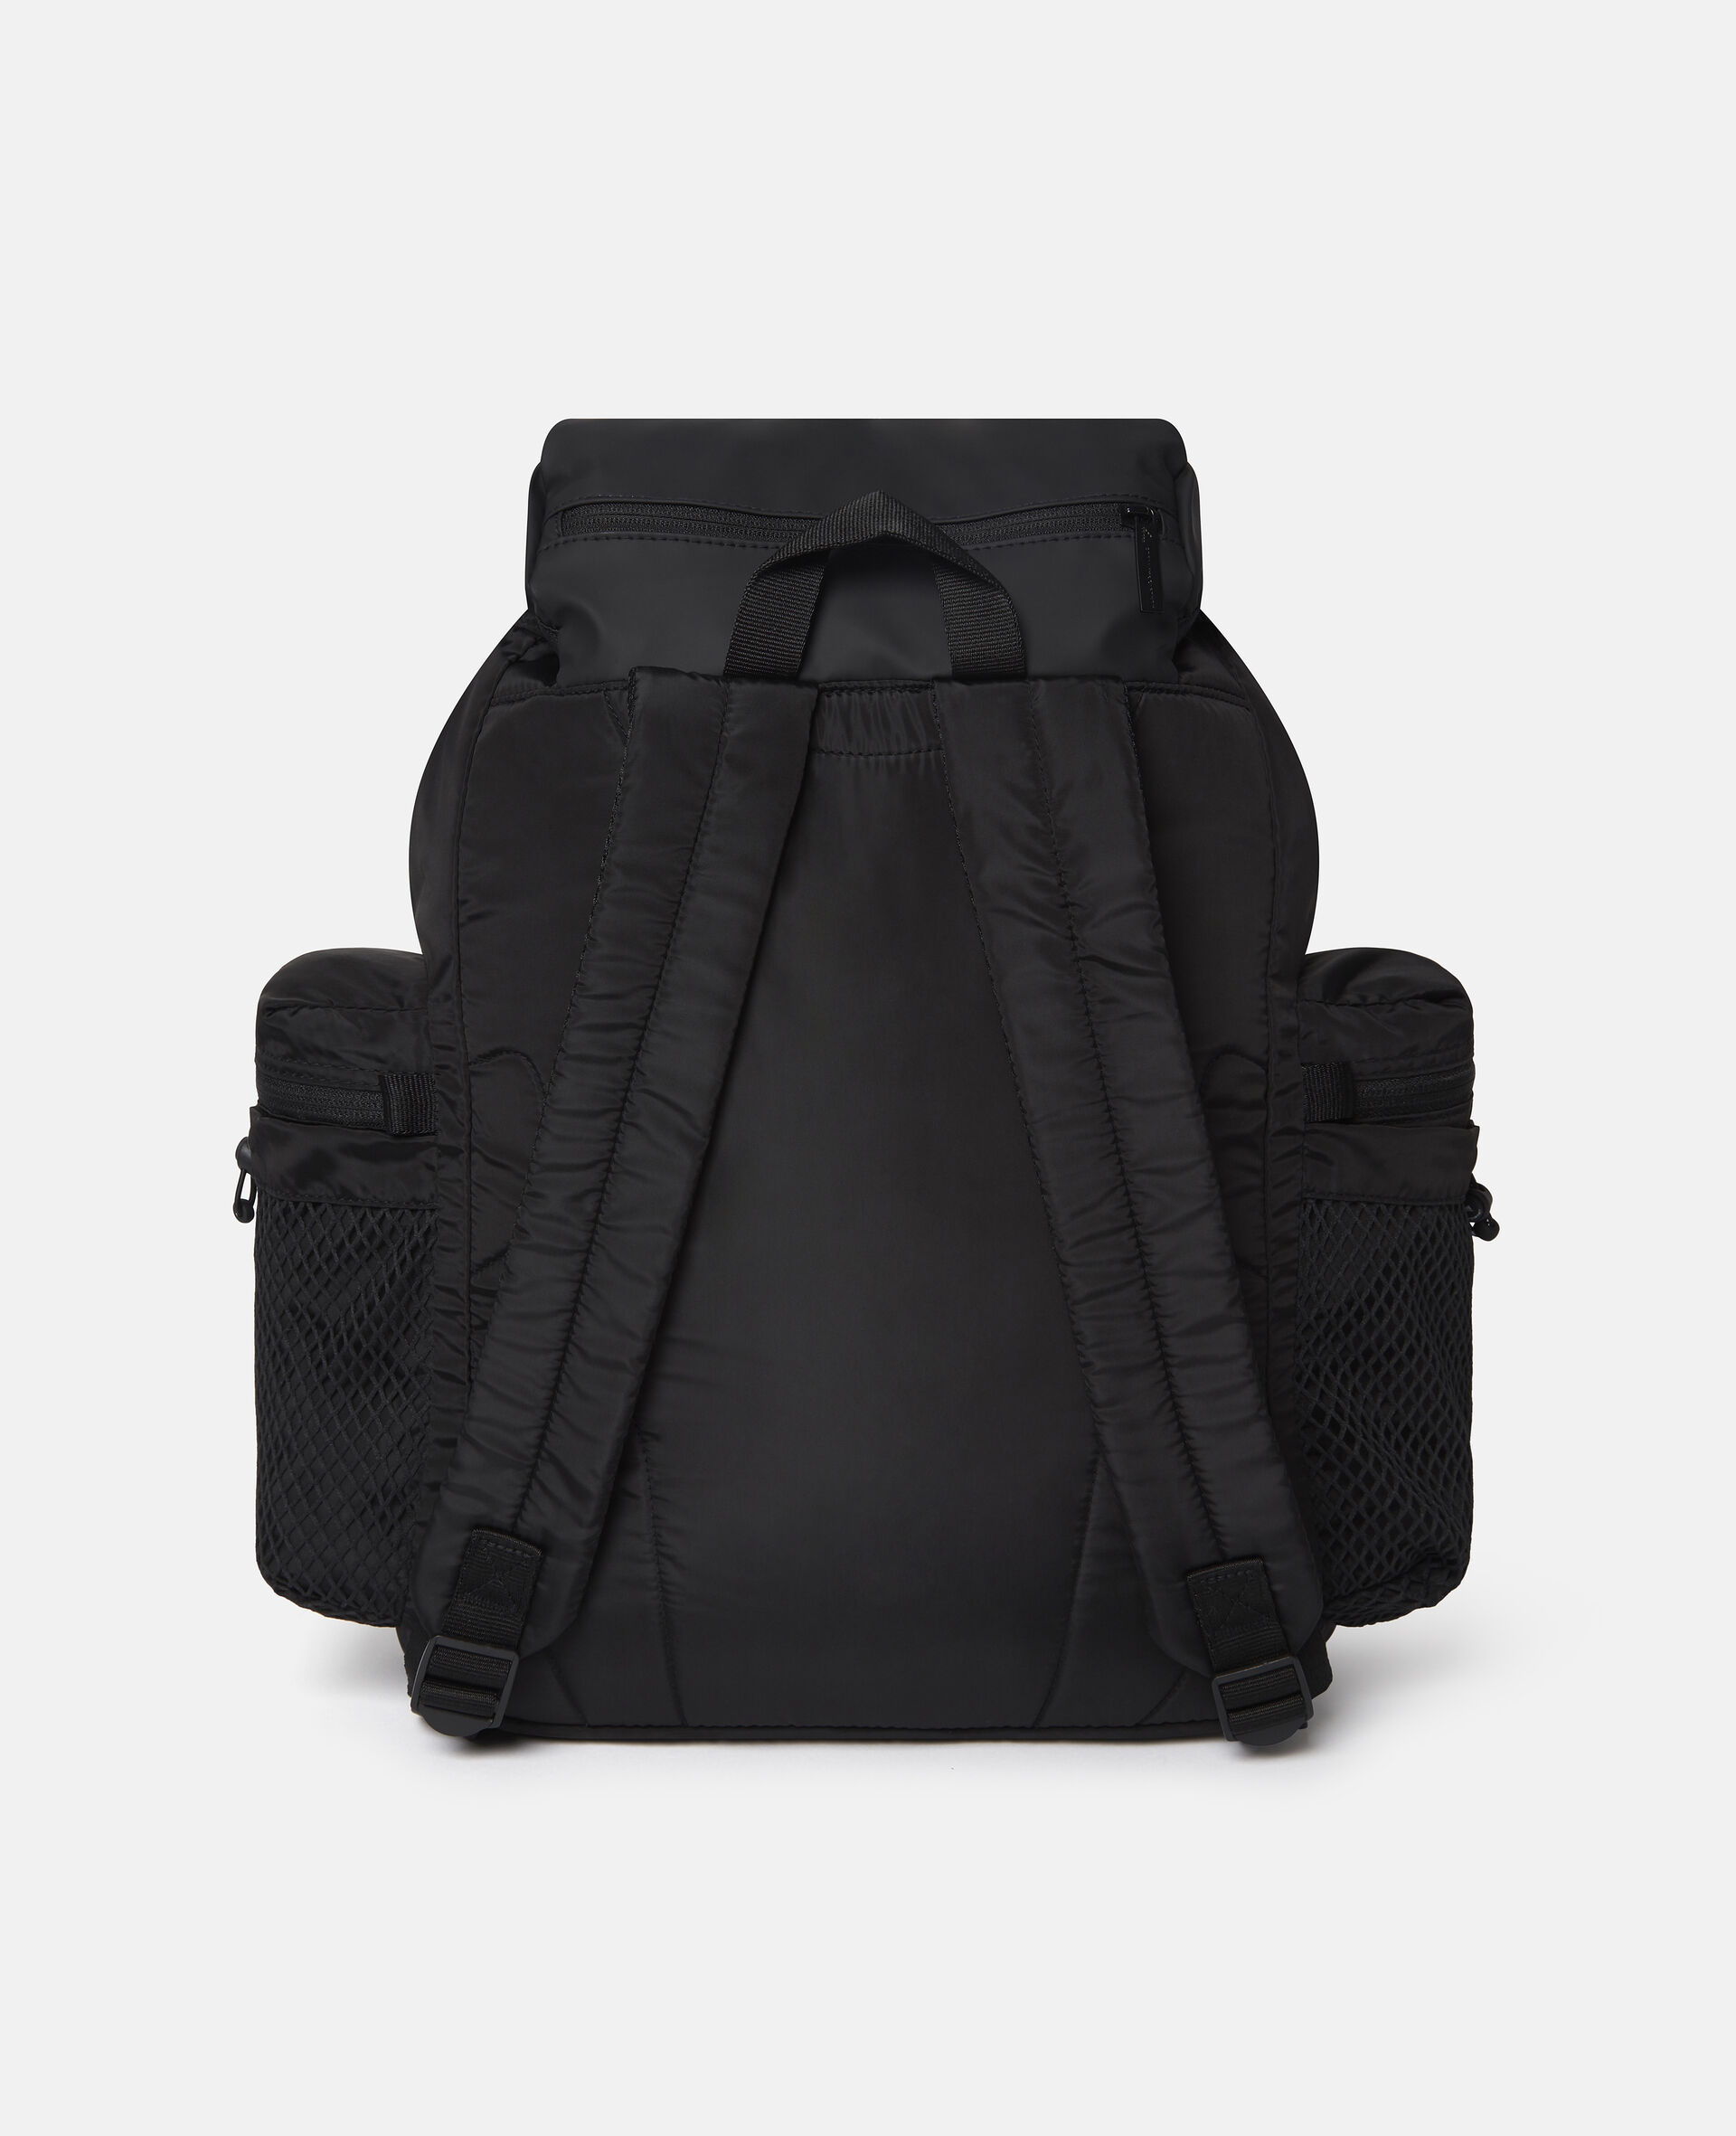 Backpack-Multicoloured-large image number 4